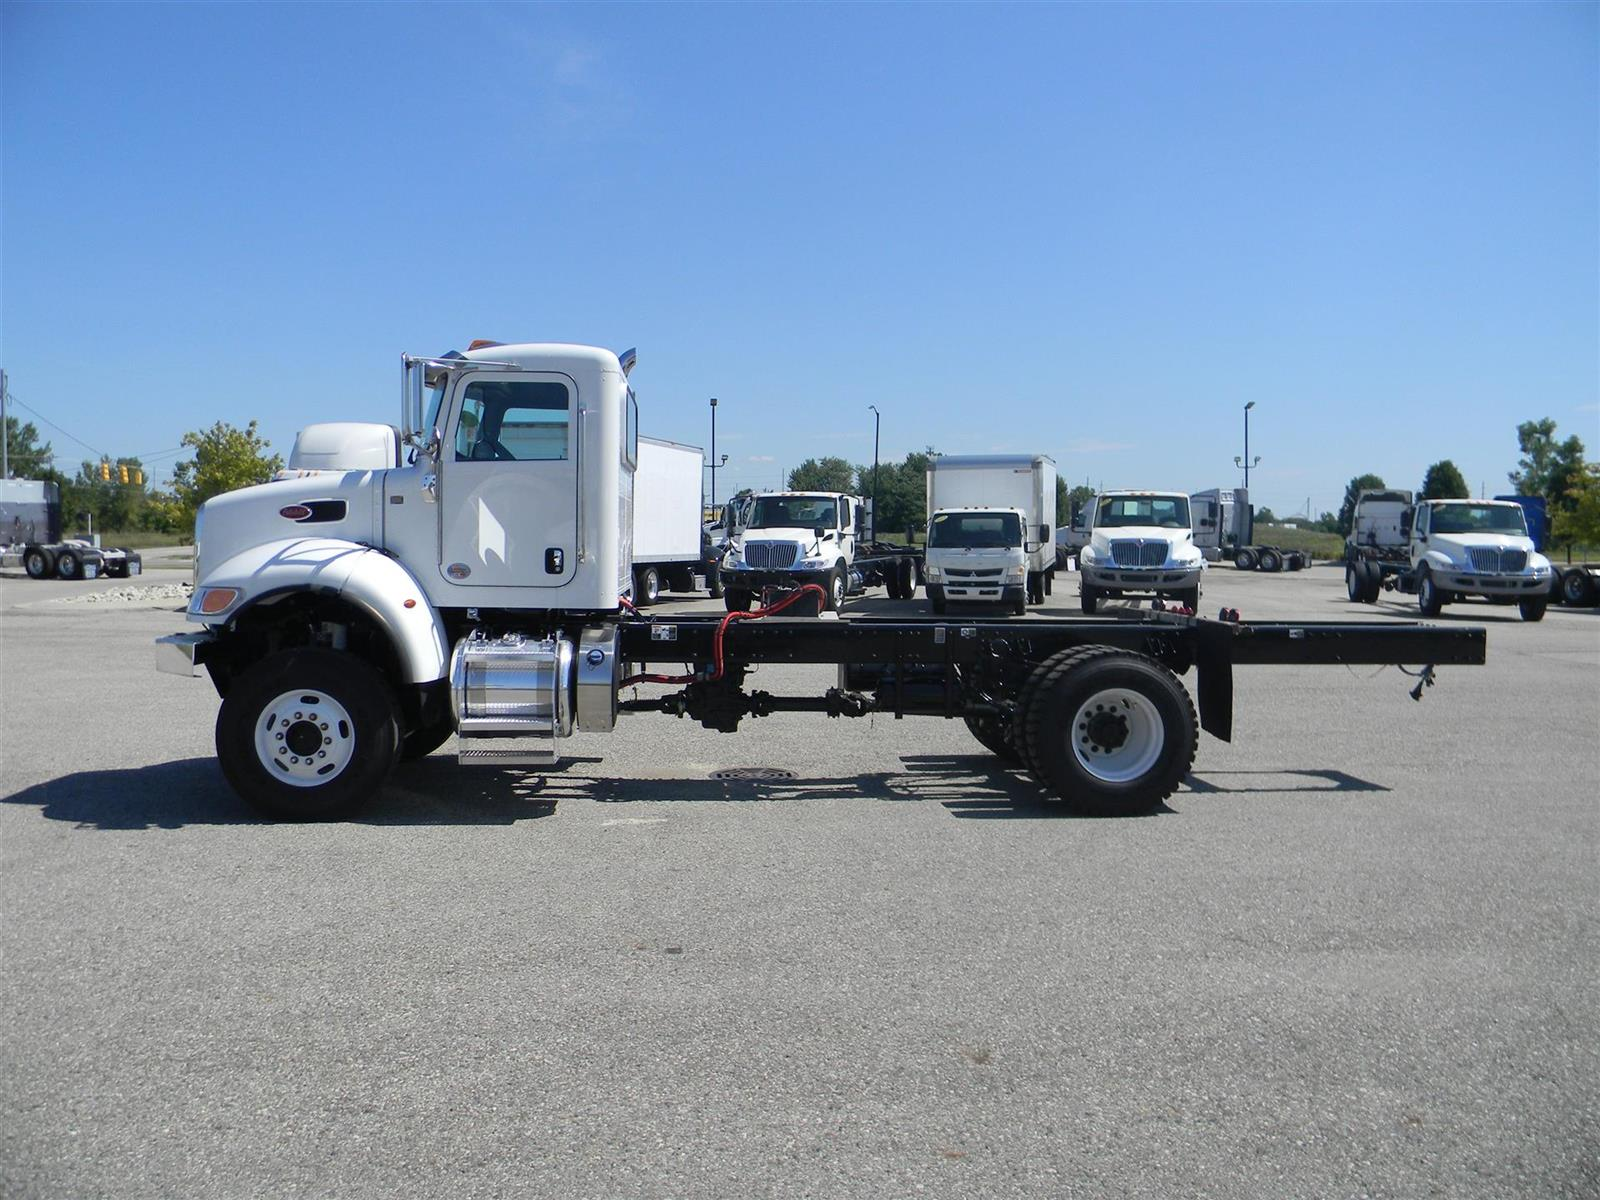 2020 Peterbilt Truck 4x4, Tractor #118847 - photo 1